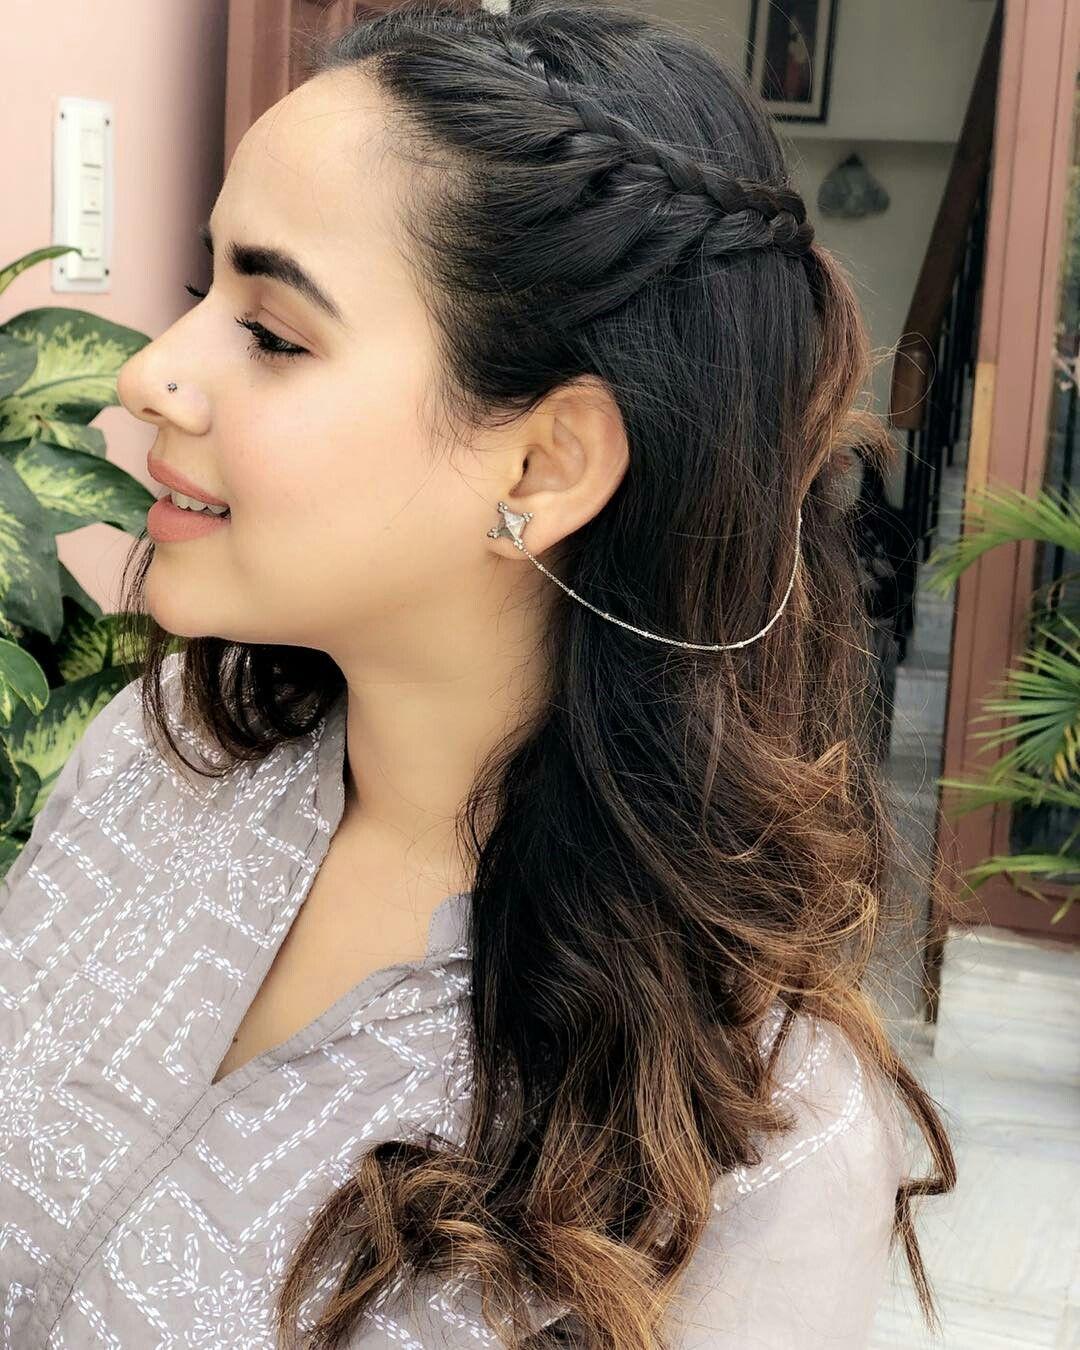 Hair Goals Follow Me Rishita Surve Pakistani Dresses Party Girl Hairstyles Cute Girl Poses